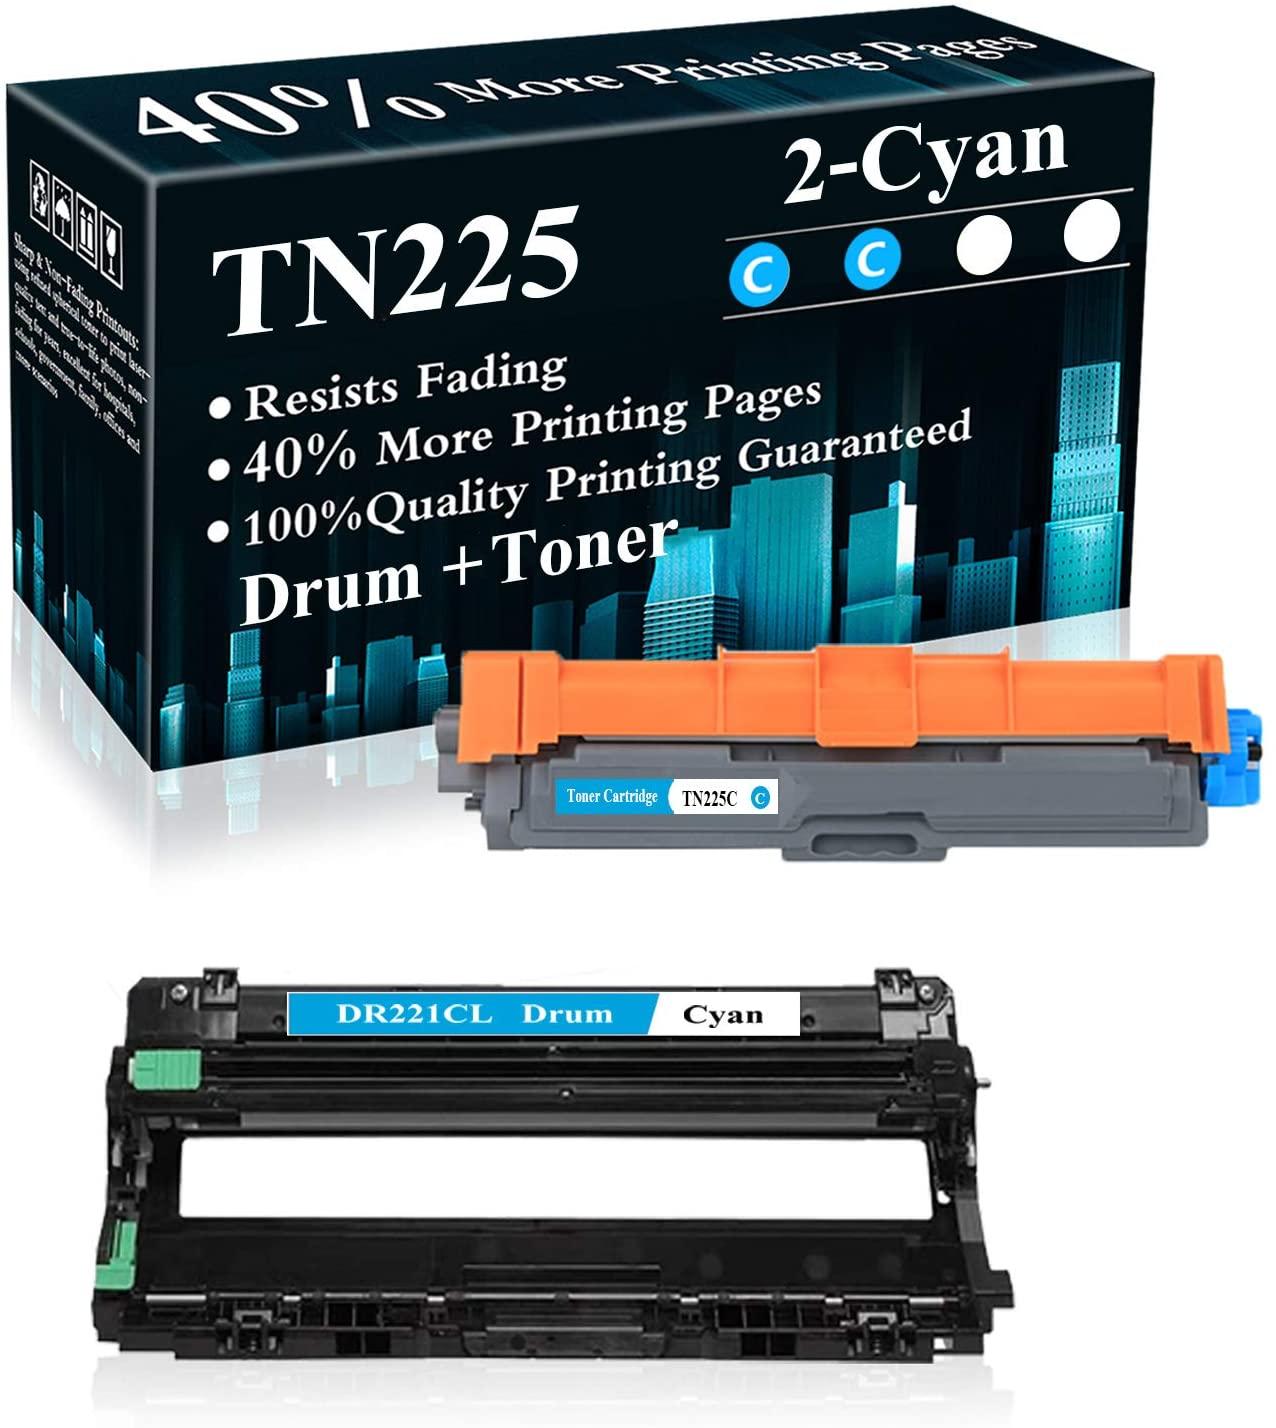 2 Pack (1Drum+1CK) DR221CL Drum Unit TN225C Toner Cartridge Replacement for Brother HL-3140CW 3150CDN 3170CDW 3180CDW 9130CW 9140CDN 9330CDW 9340CDW 9015CDW 9020CDN Printer